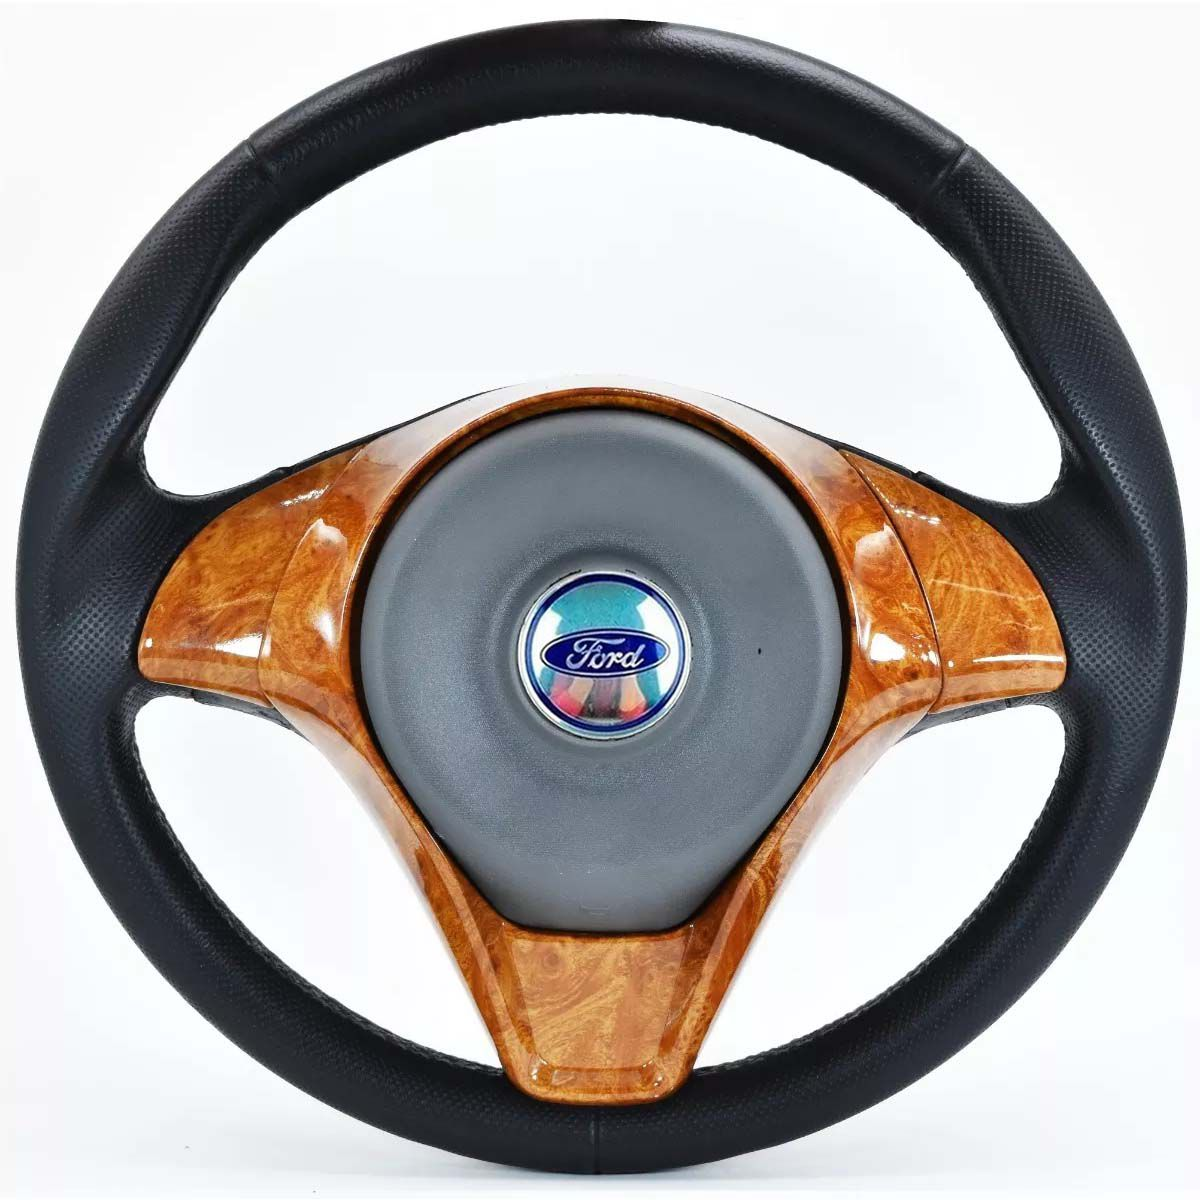 Volante Esportivo Palio Sporting Ford Ka Fiesta Escort Zetec Hobby Pampa F100 F1000 F75 F250 Verona Del Rey Belina Ecosport Logus Acionador de Buzia + Cubo